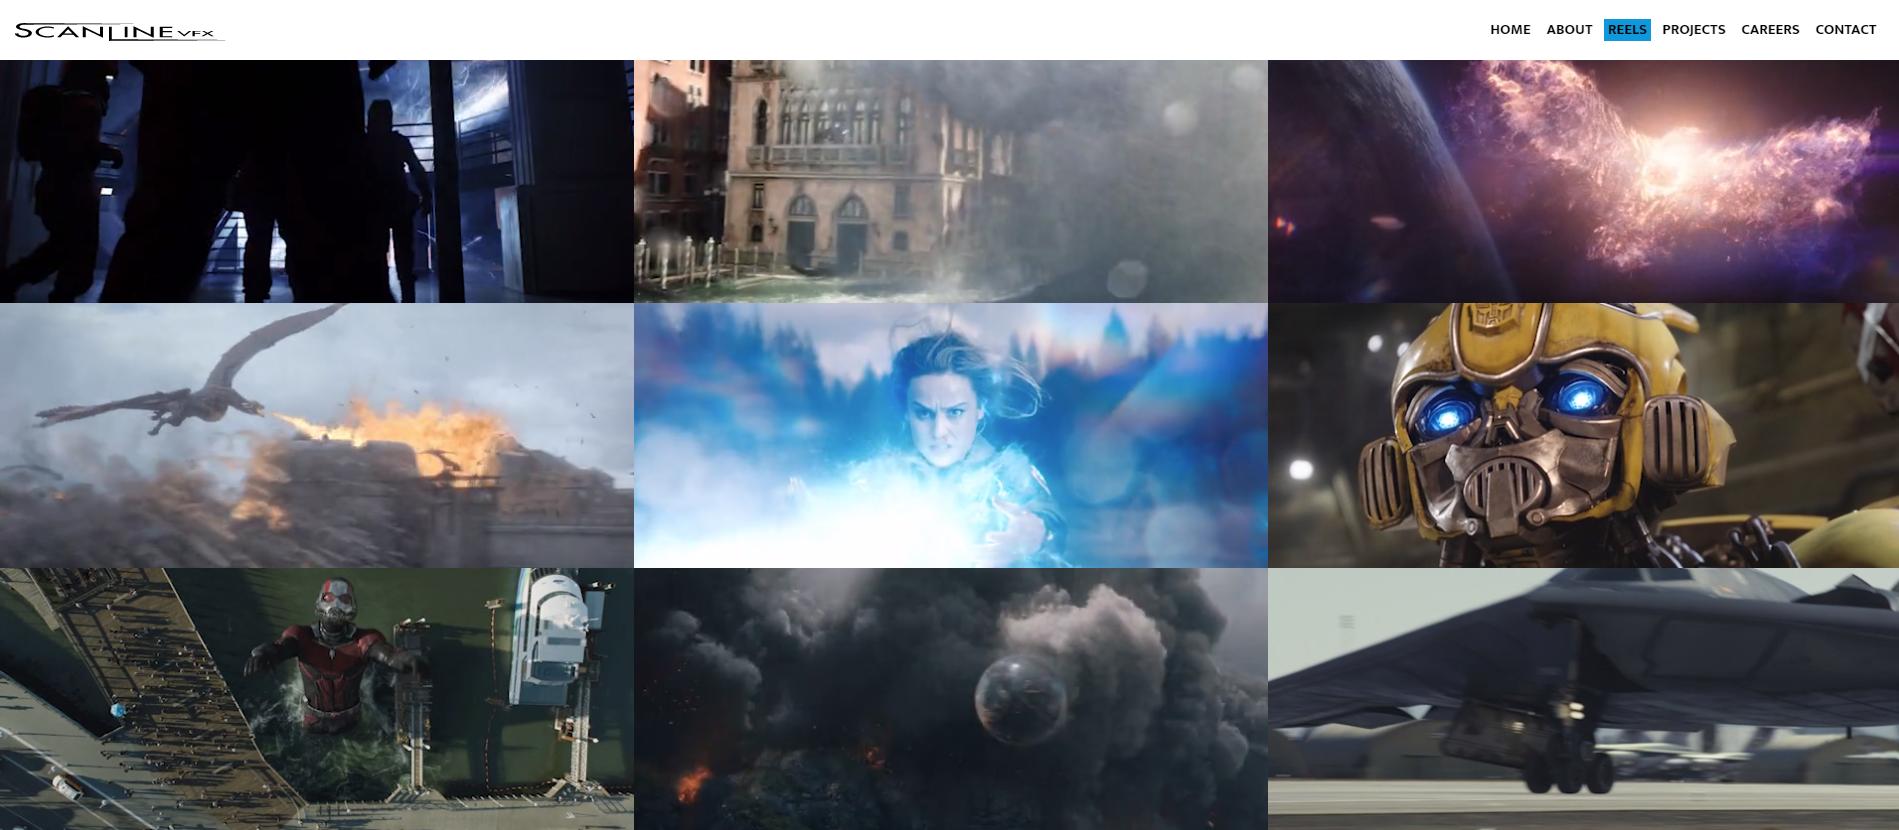 流体模拟大佬Scanline VFX 分享CG电影视觉特效秘笈-Scanline VFX 制作的电影